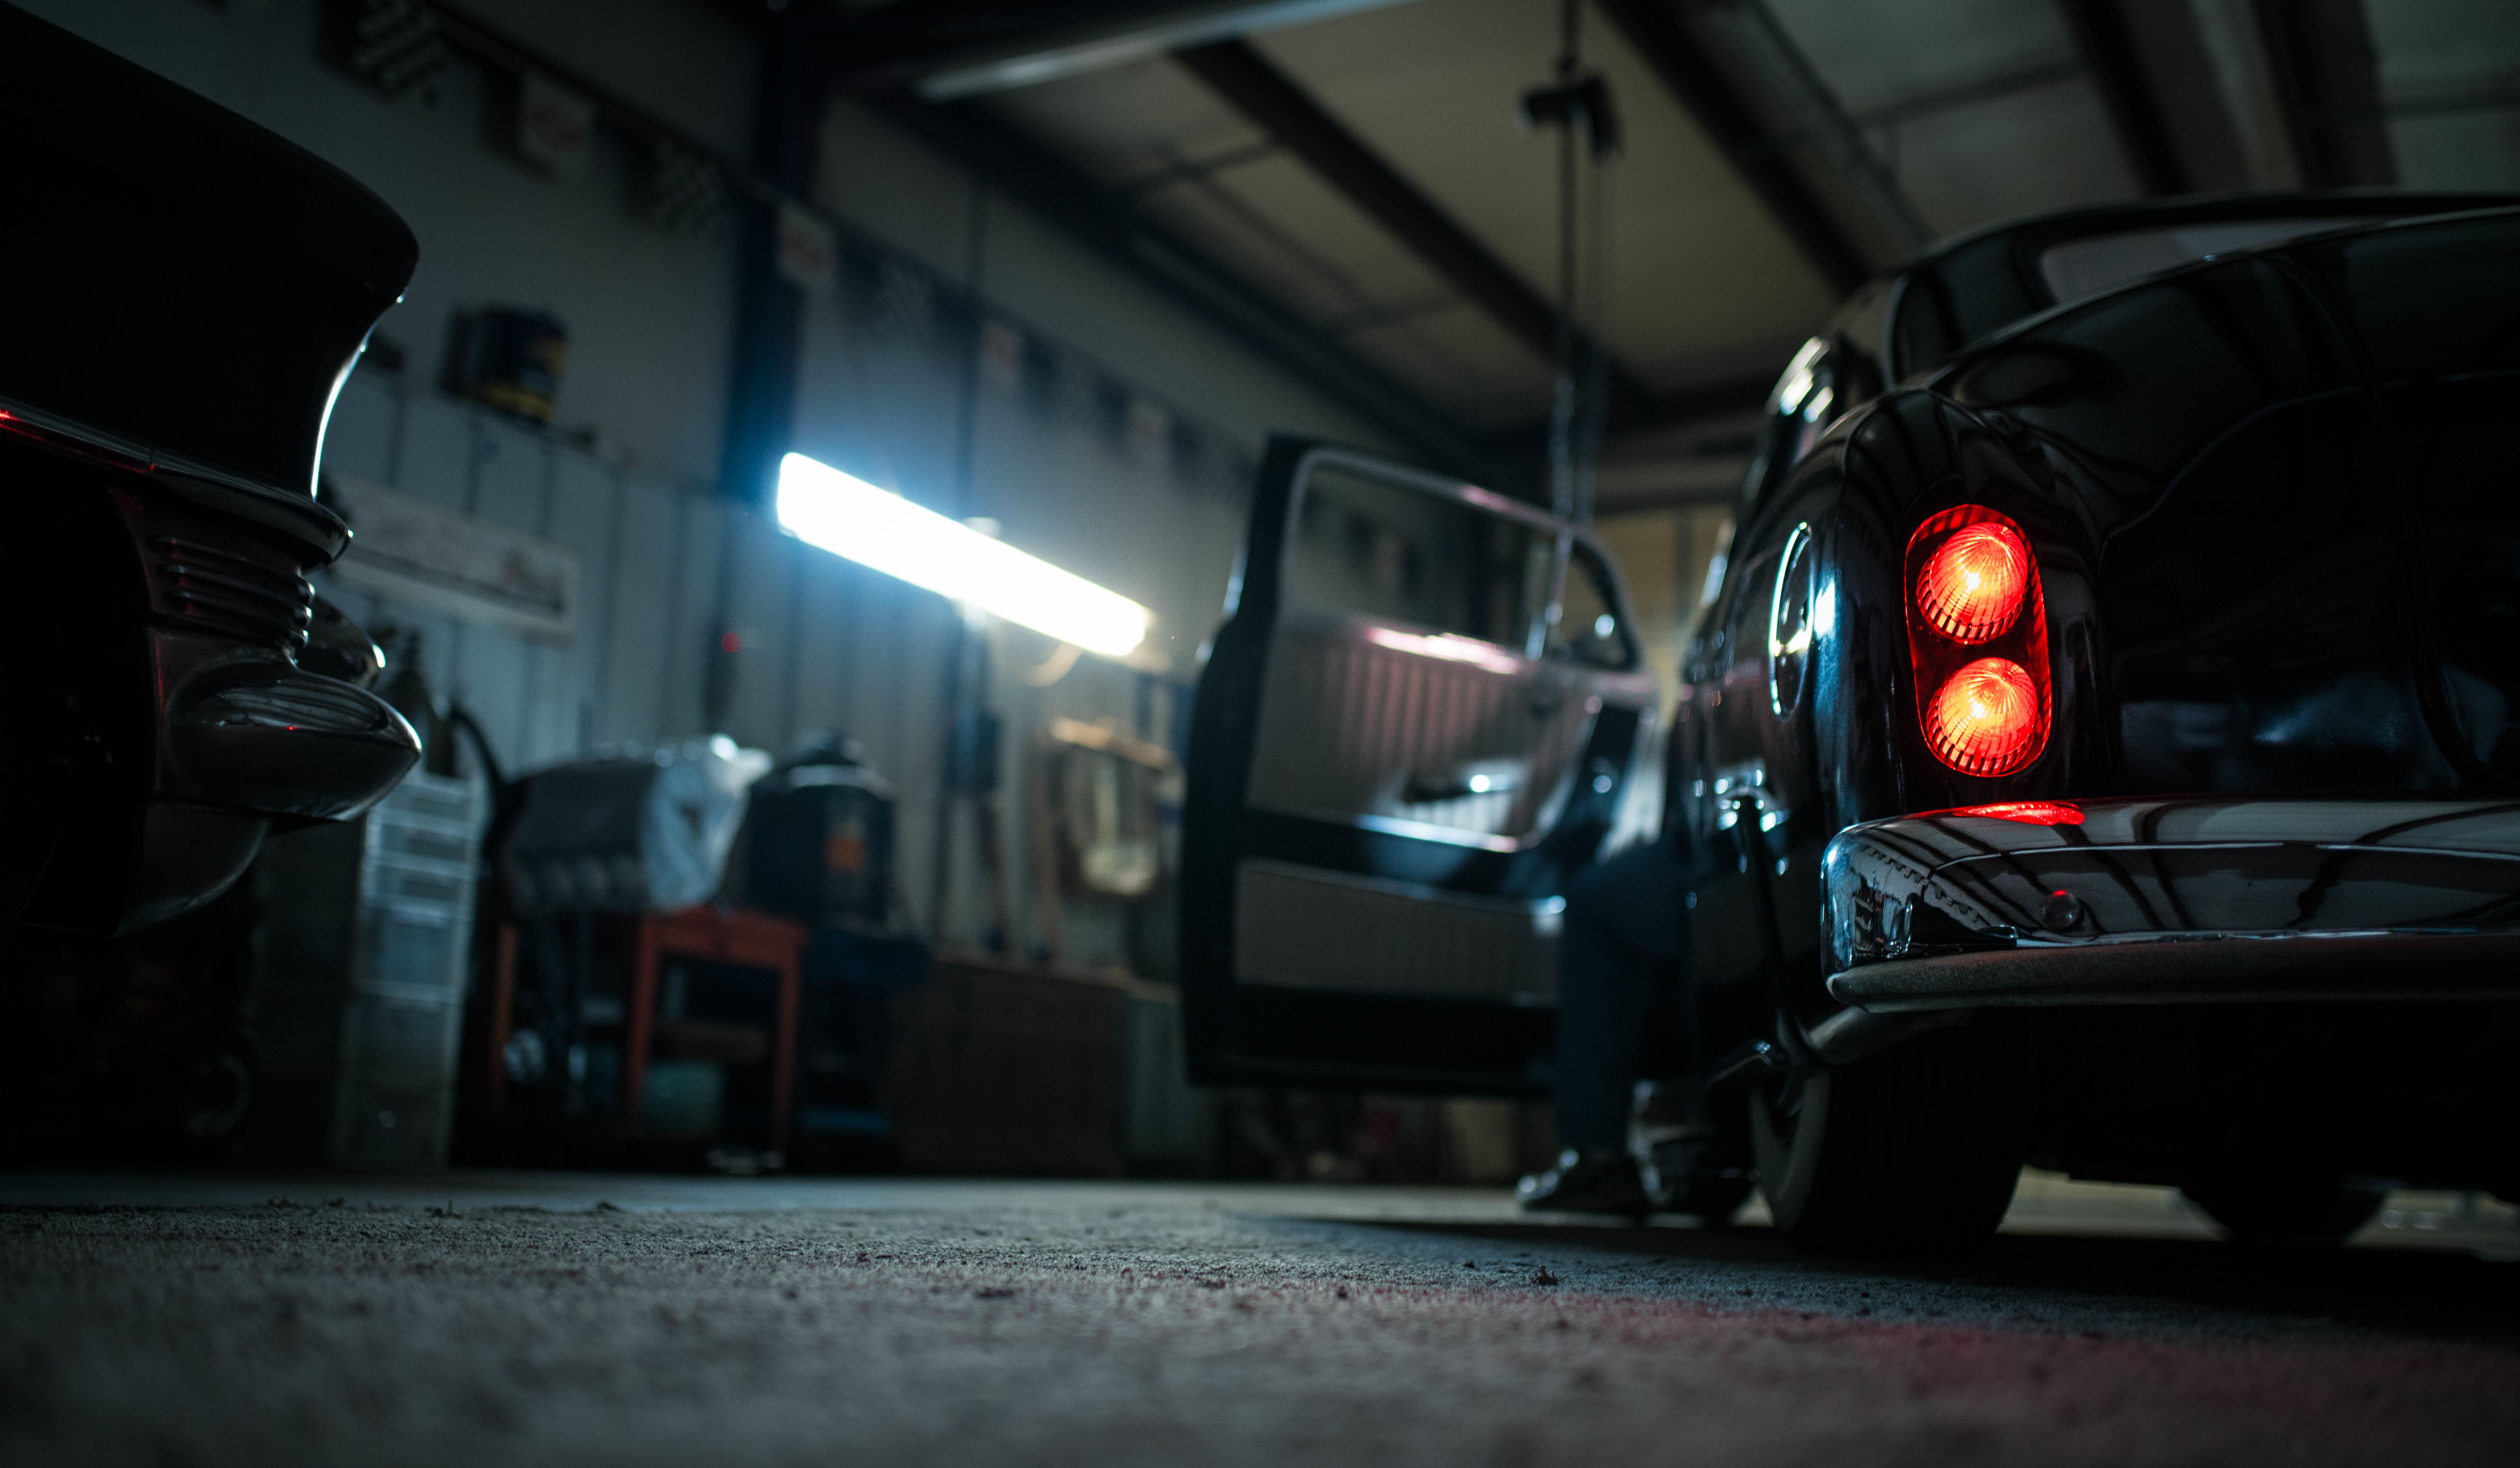 Free Images Light Night Transport Garage Darkness